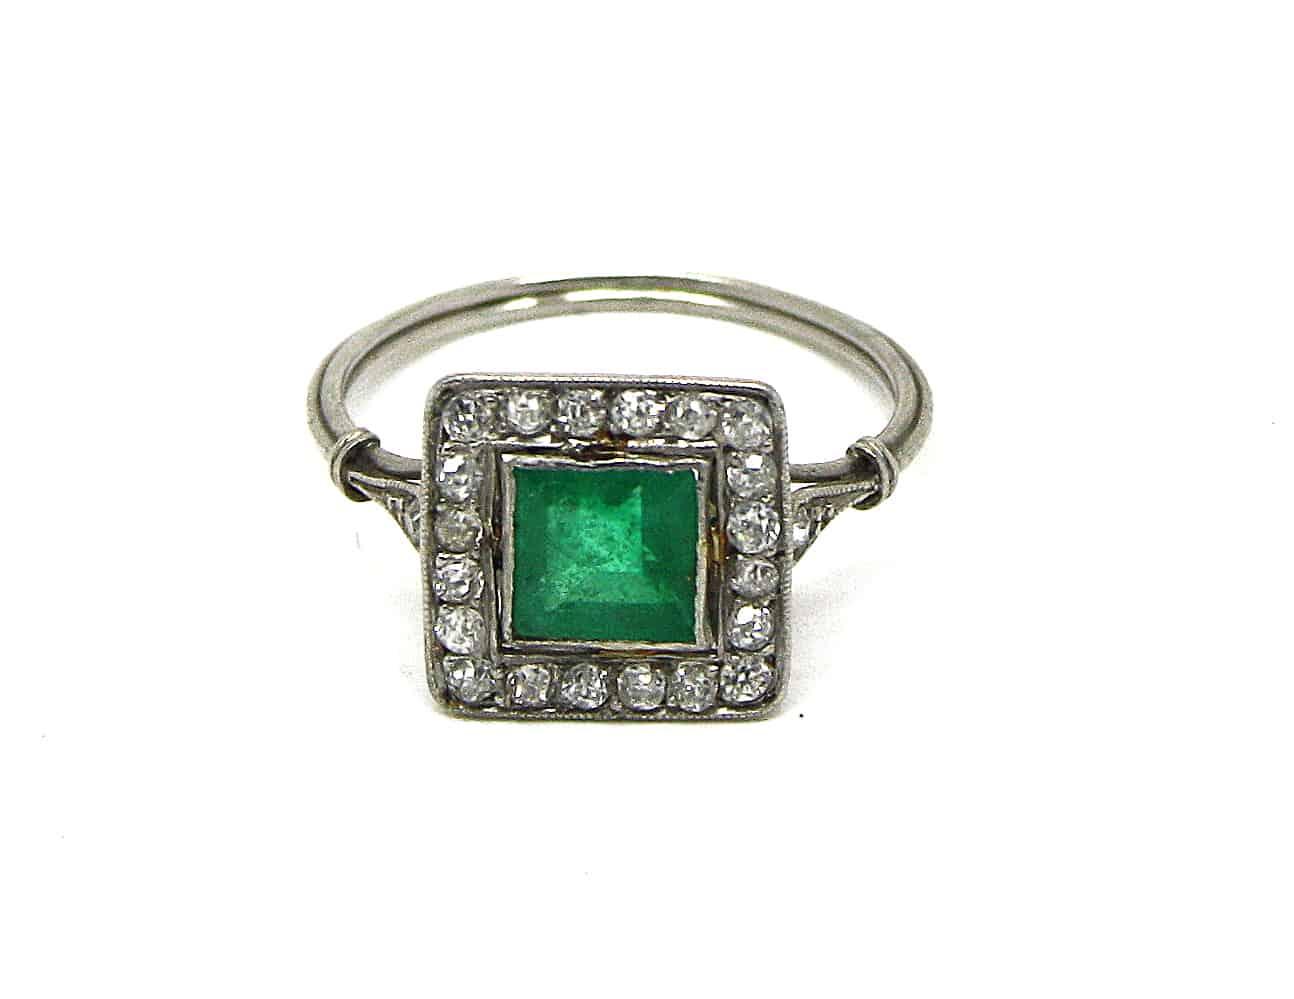 Antique Emerald Ring Kish Jewellers Dublin